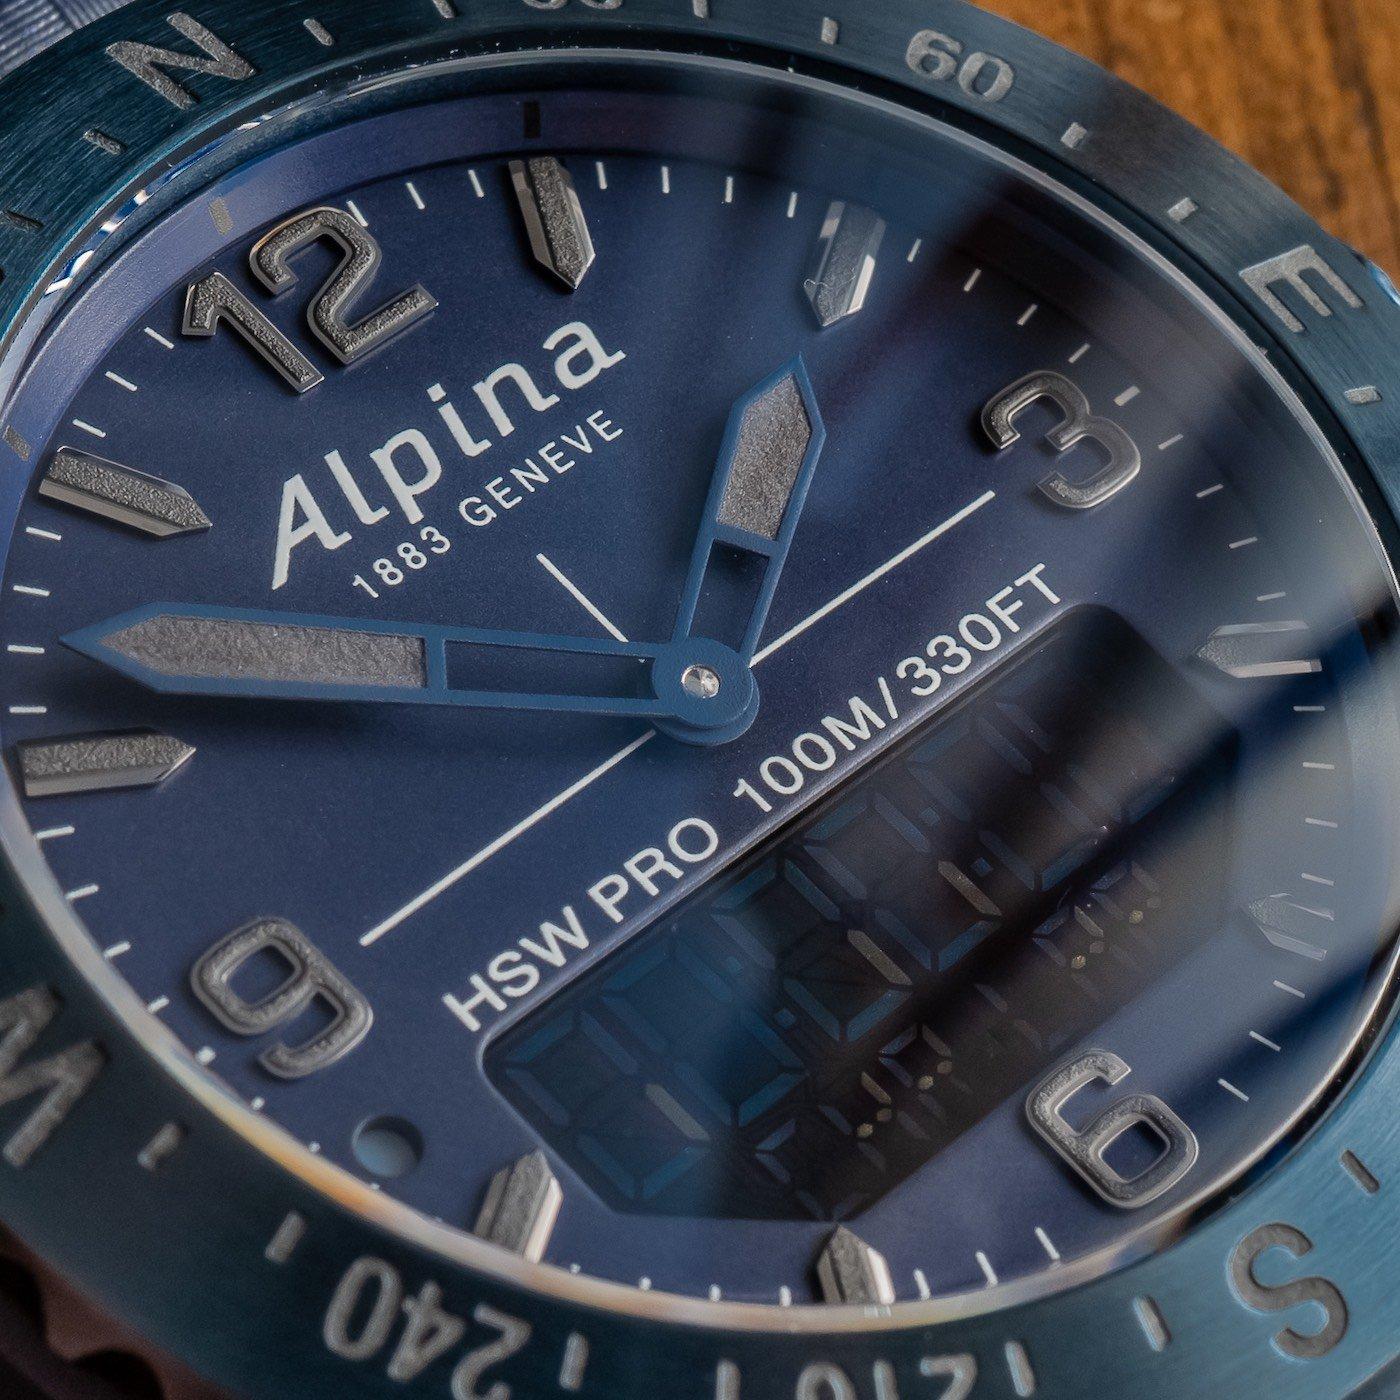 alpina alpinerx space